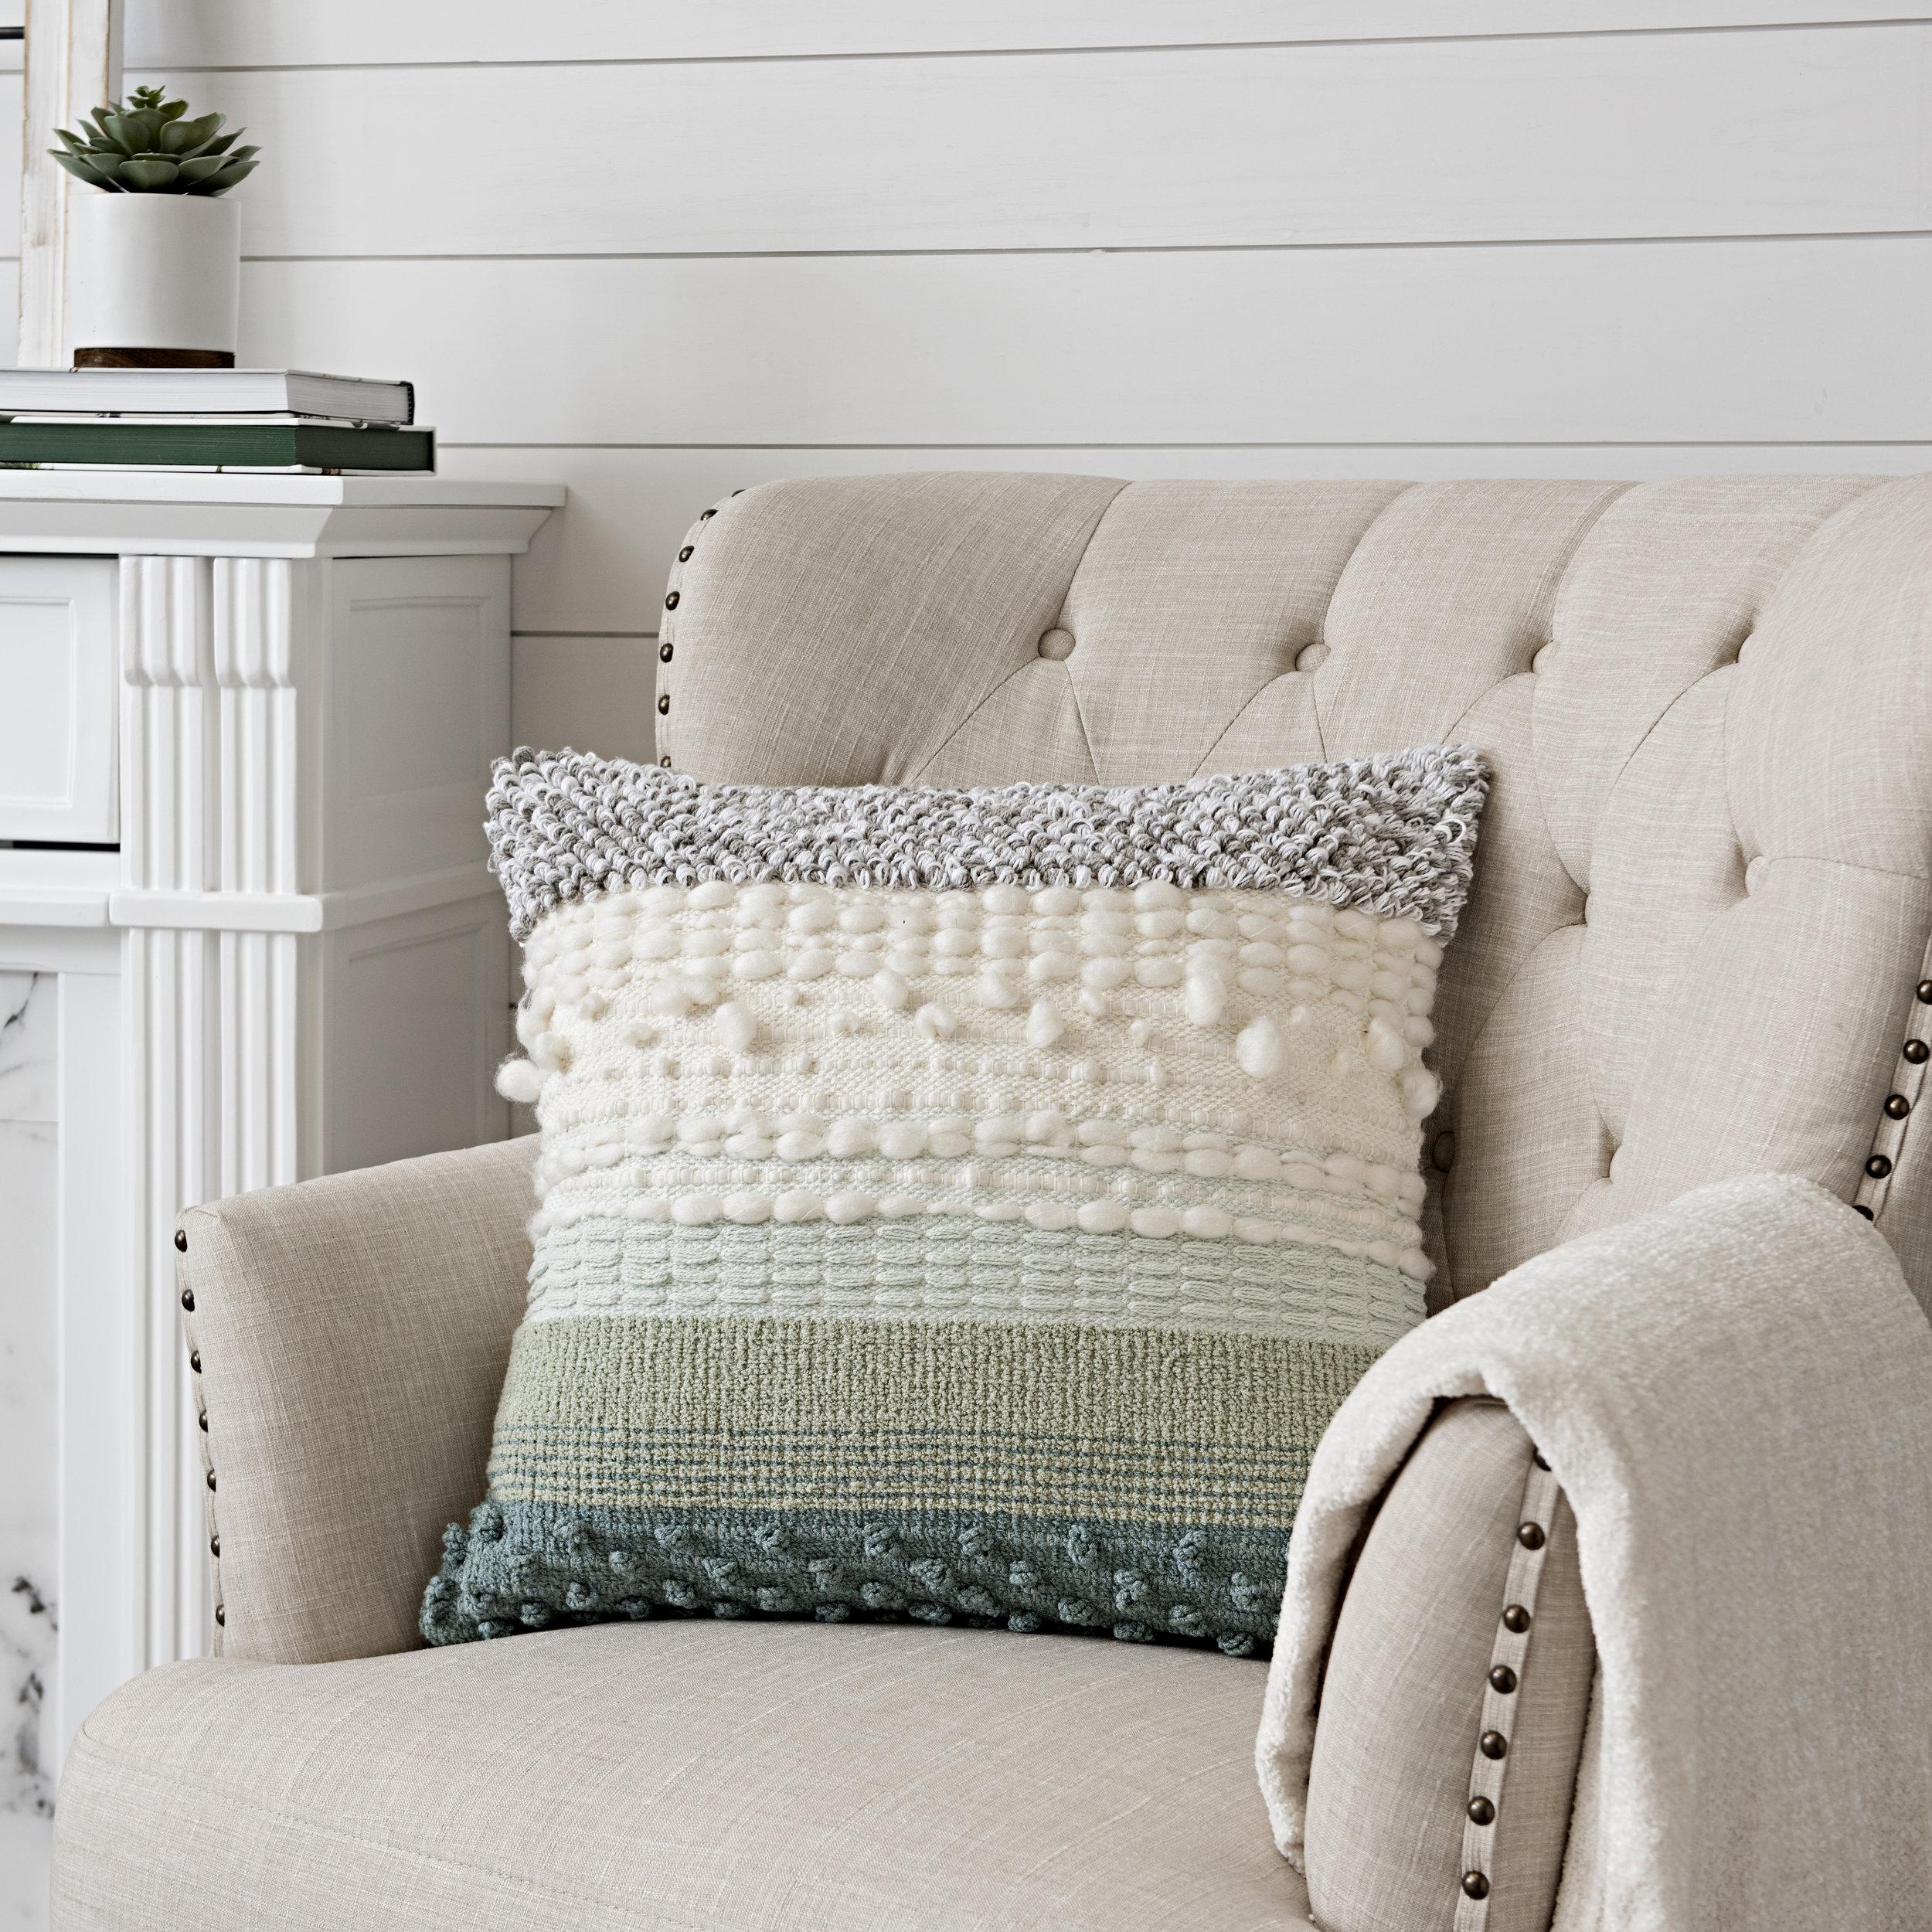 Kirkland's - Skyler Textured Pillow